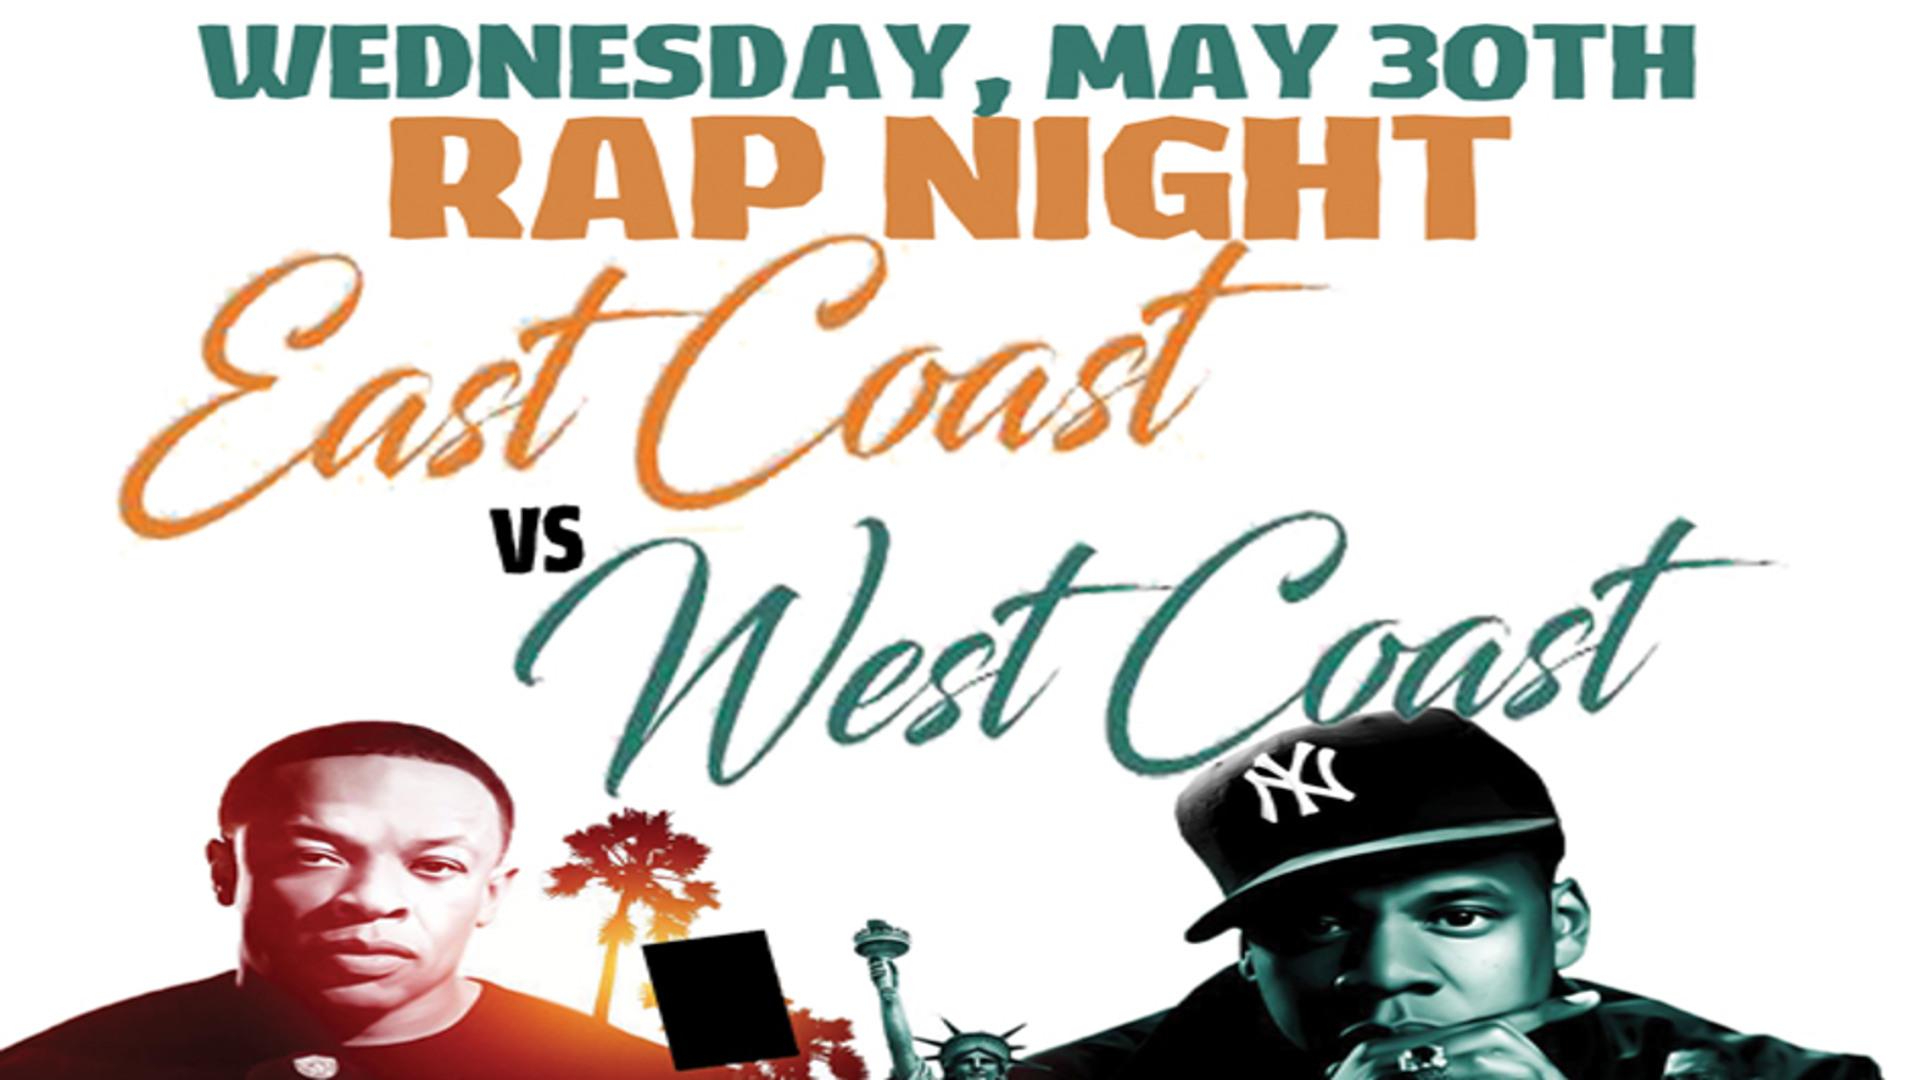 sasquatch rap night may 30 2018 fb event.jpg